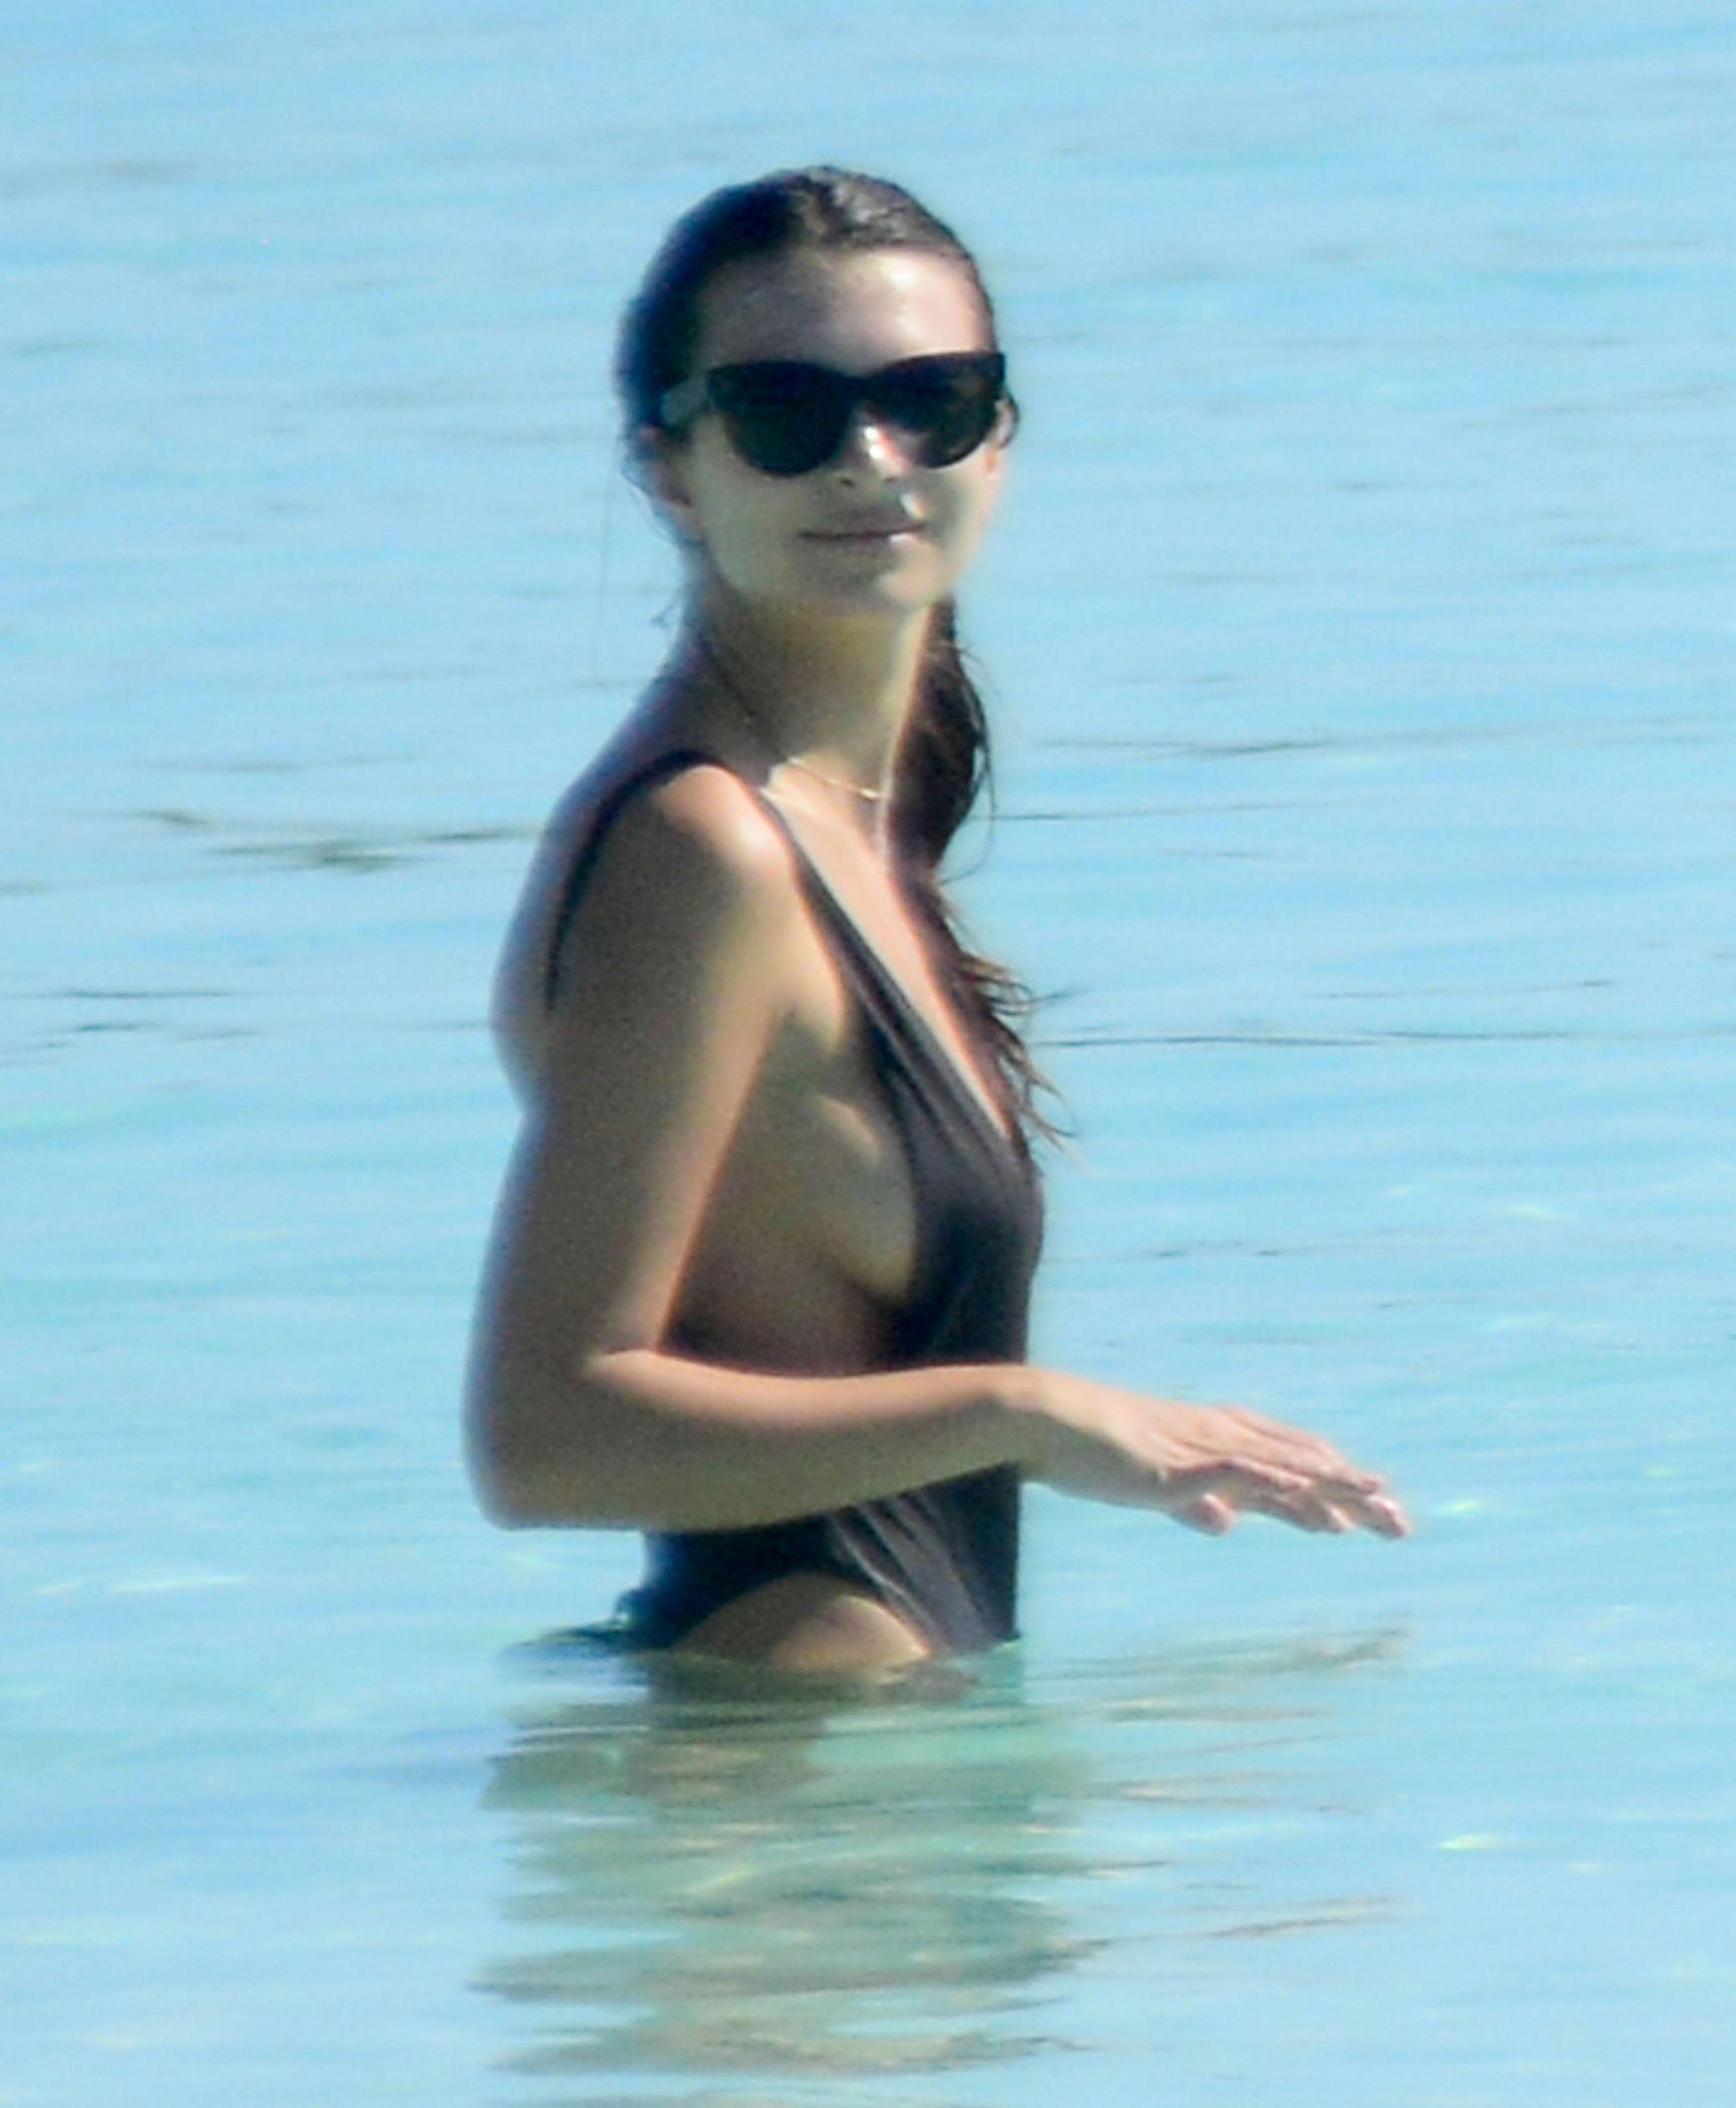 Emily Ratajkowski nipples exposed